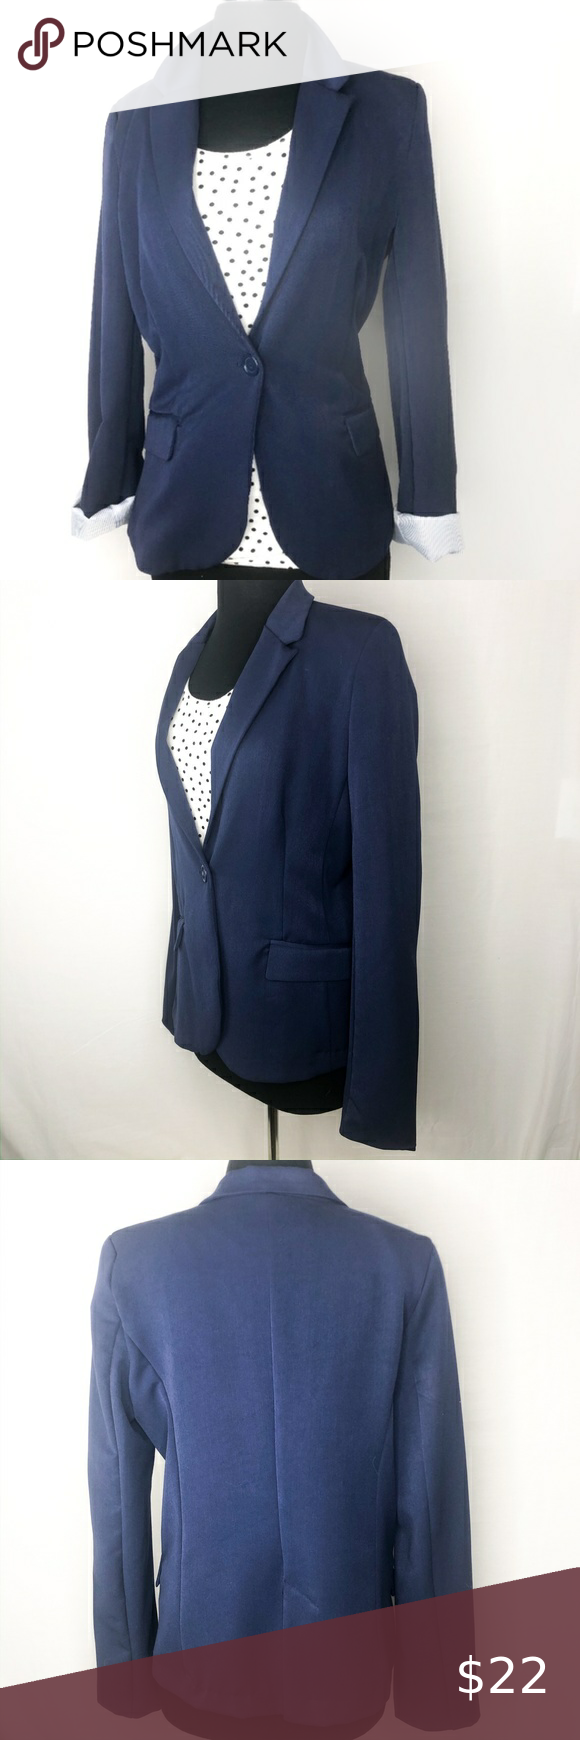 Spotted while shopping on Poshmark: Ambiance Royal Blue Single Button Padded Blazer! #poshmark #fashion #shopping #style #Ambiance #Jackets & Blazers